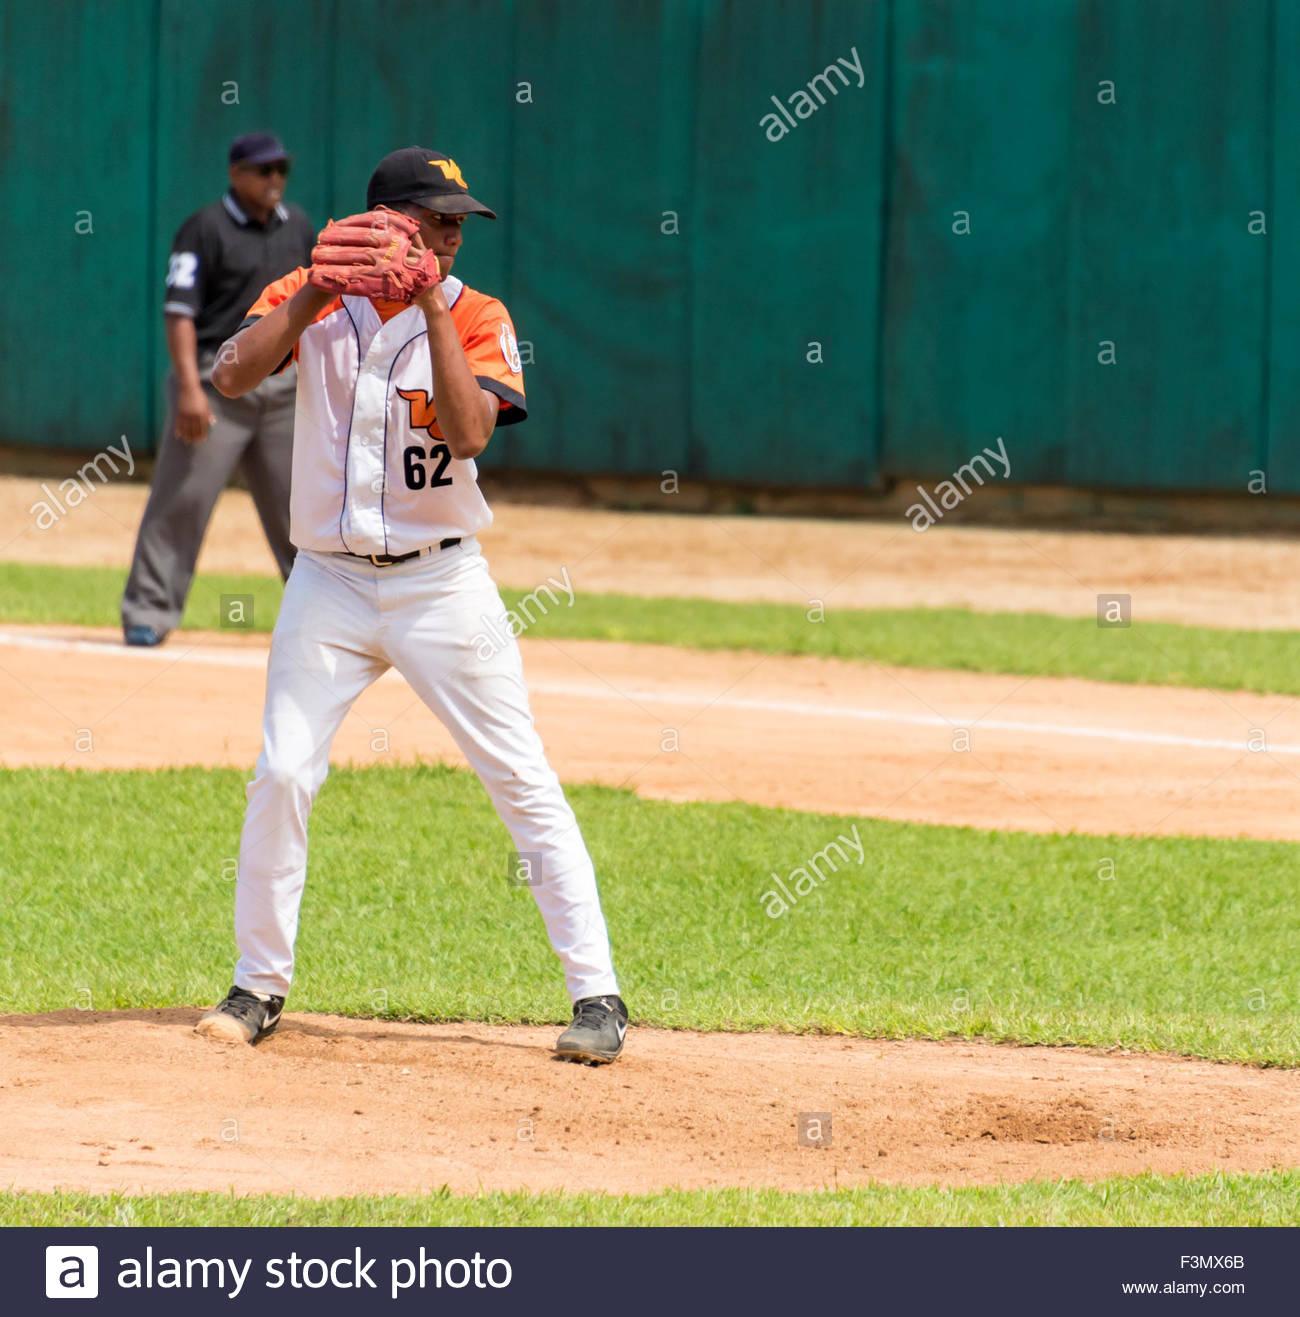 cuban baseball, team Industriales vs Villa Clara, Henry Luis Mazorra Fabregat pitching for villa clara - Stock Image